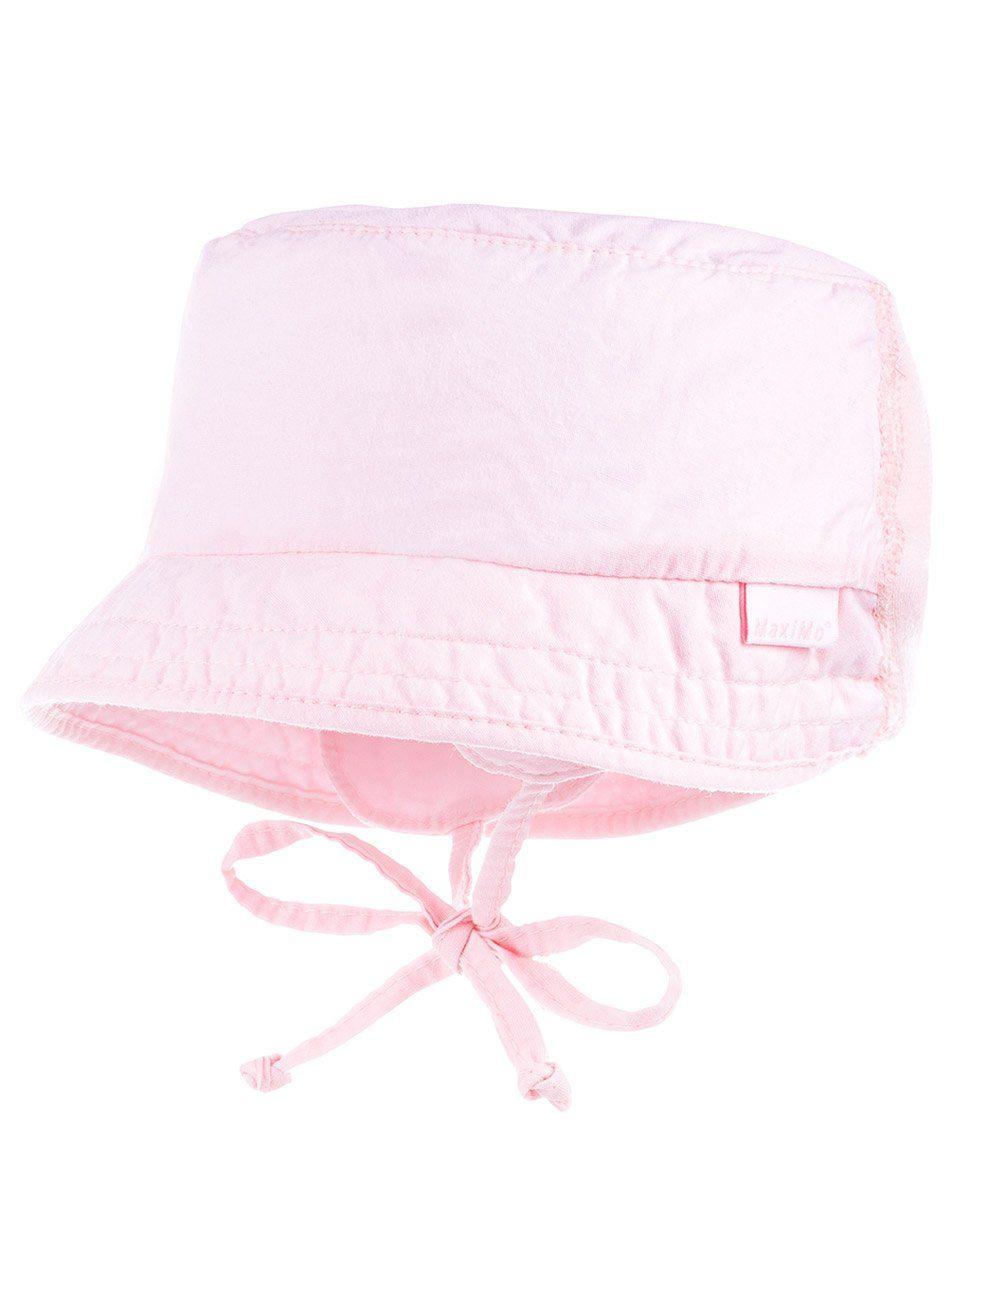 Mud Pie Holiday Pretty in Pink Baby Girl Pink Ruffle Kimono Sleeper 1132208